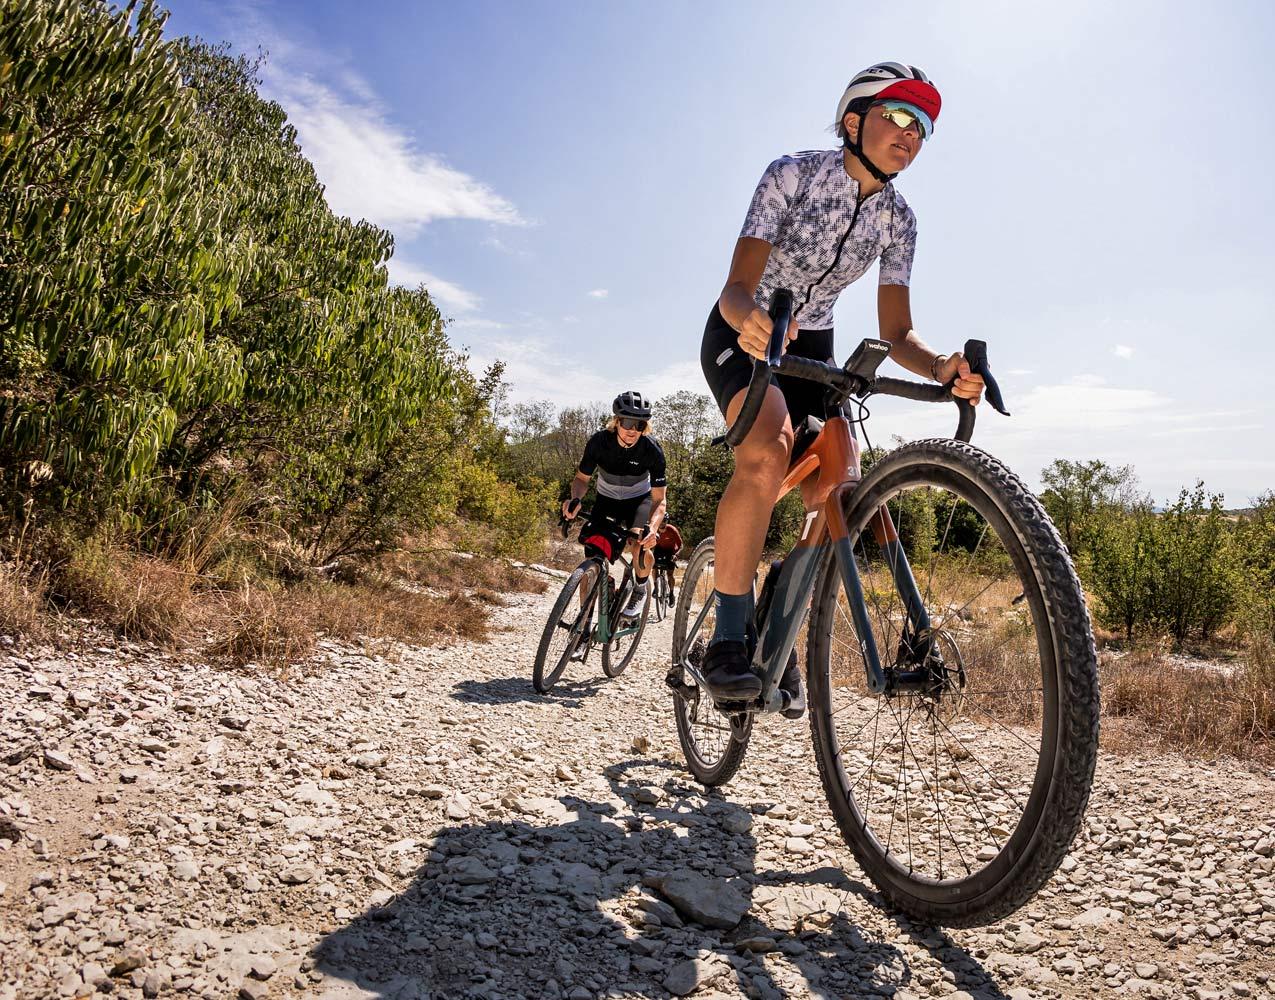 Fulcrum Rapid Red Carbon lightweight asymmetric tubeless gravel bike wheels,gravel roads